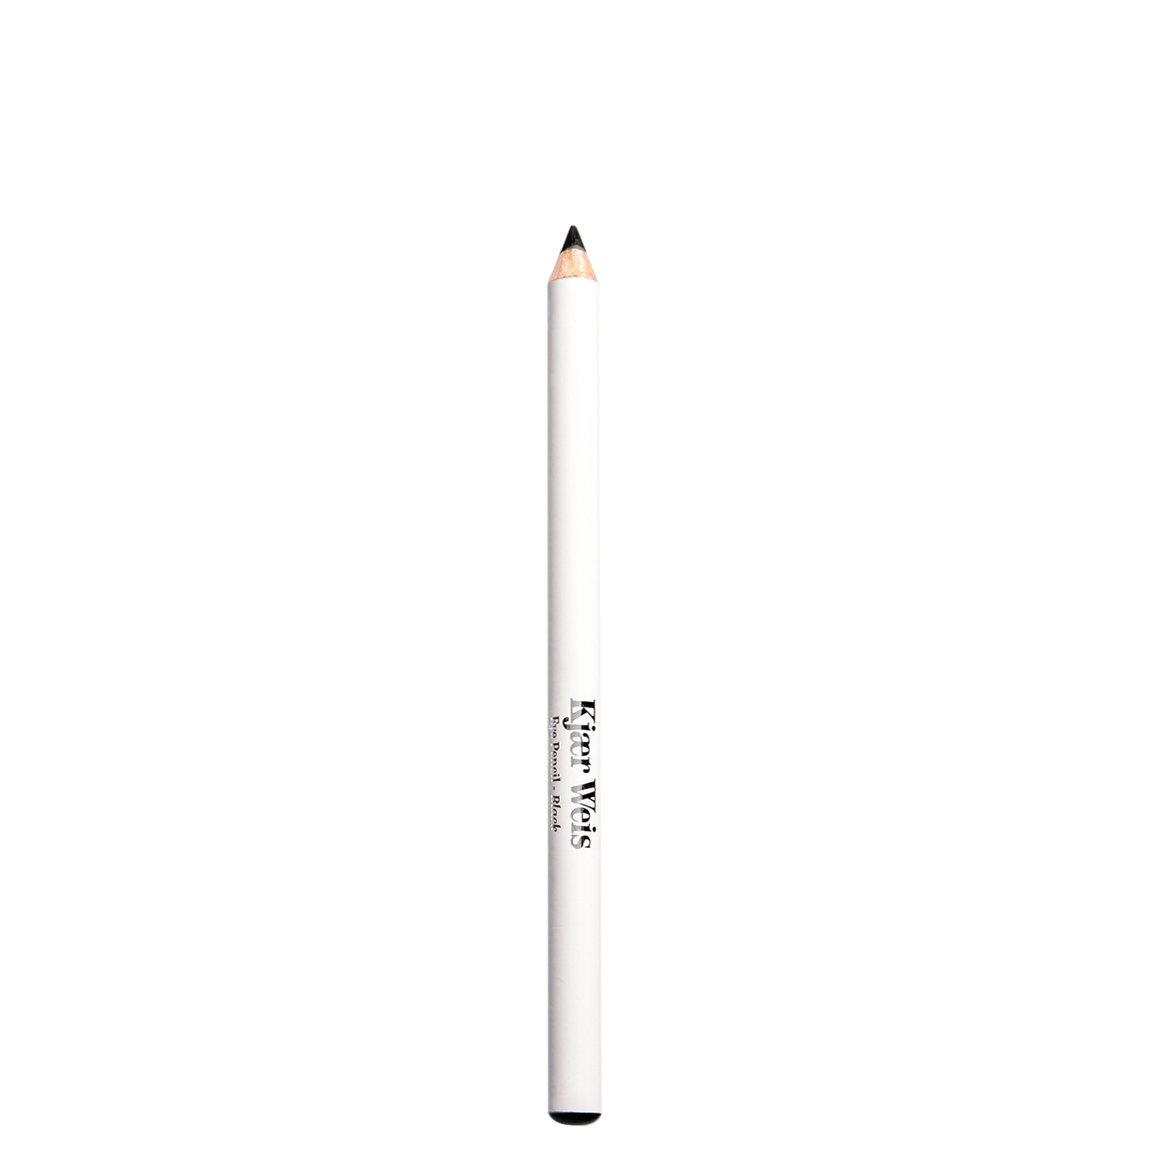 Kjaer Weis Eye Pencil Black alternative view 1.